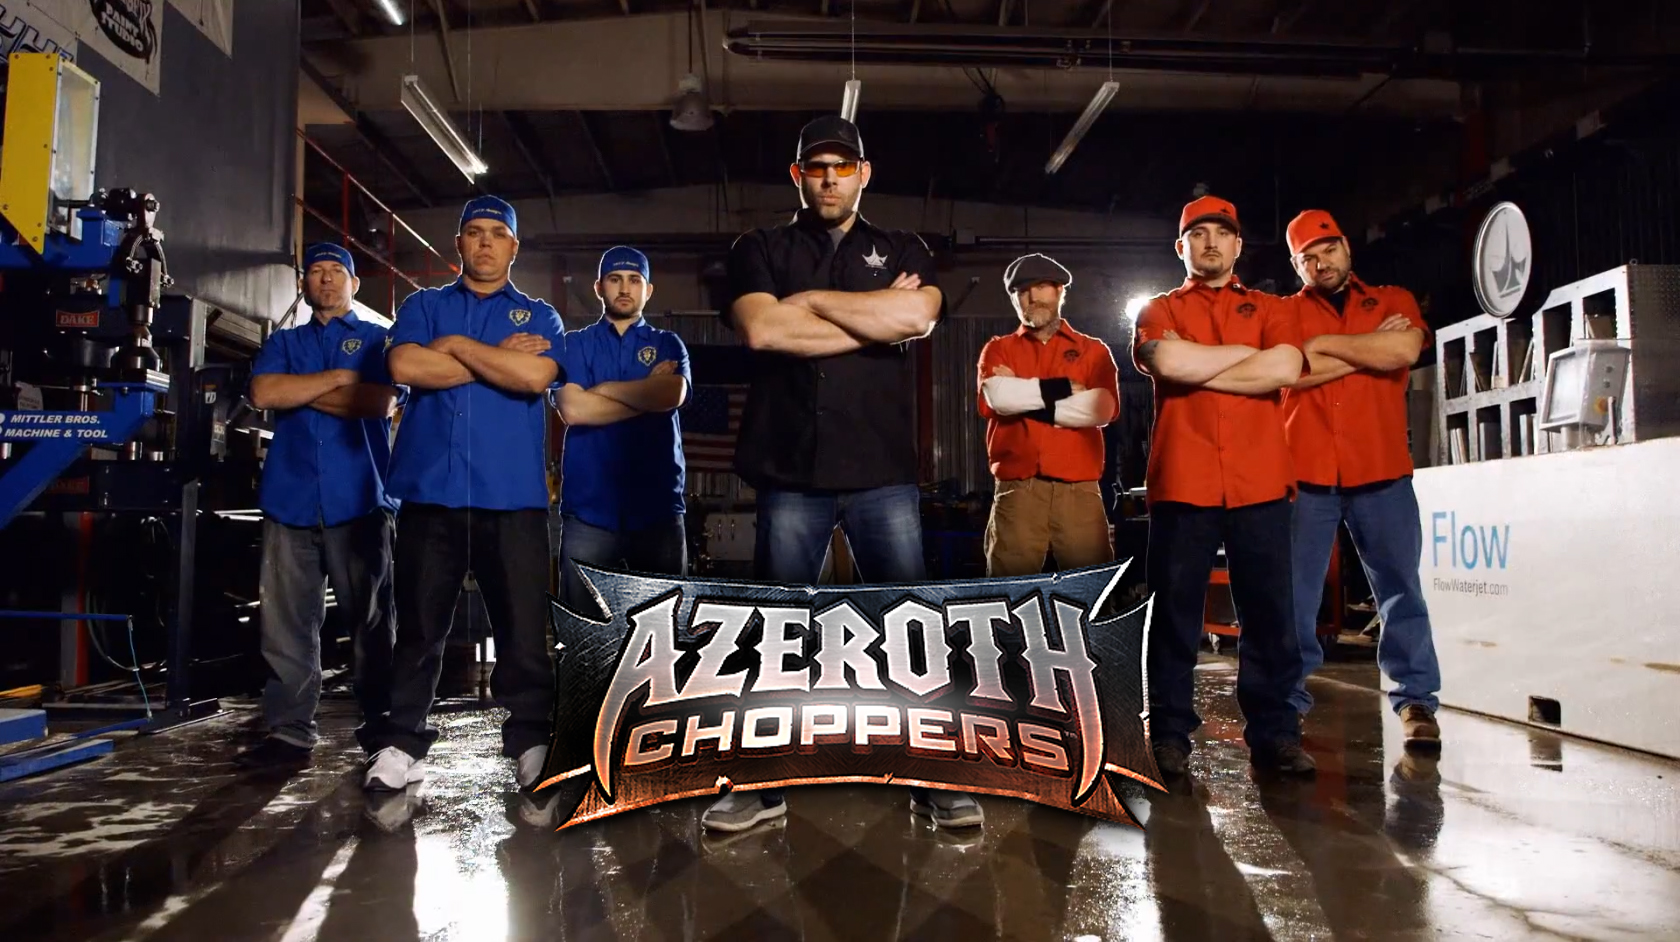 2503775-azerothchoppers1